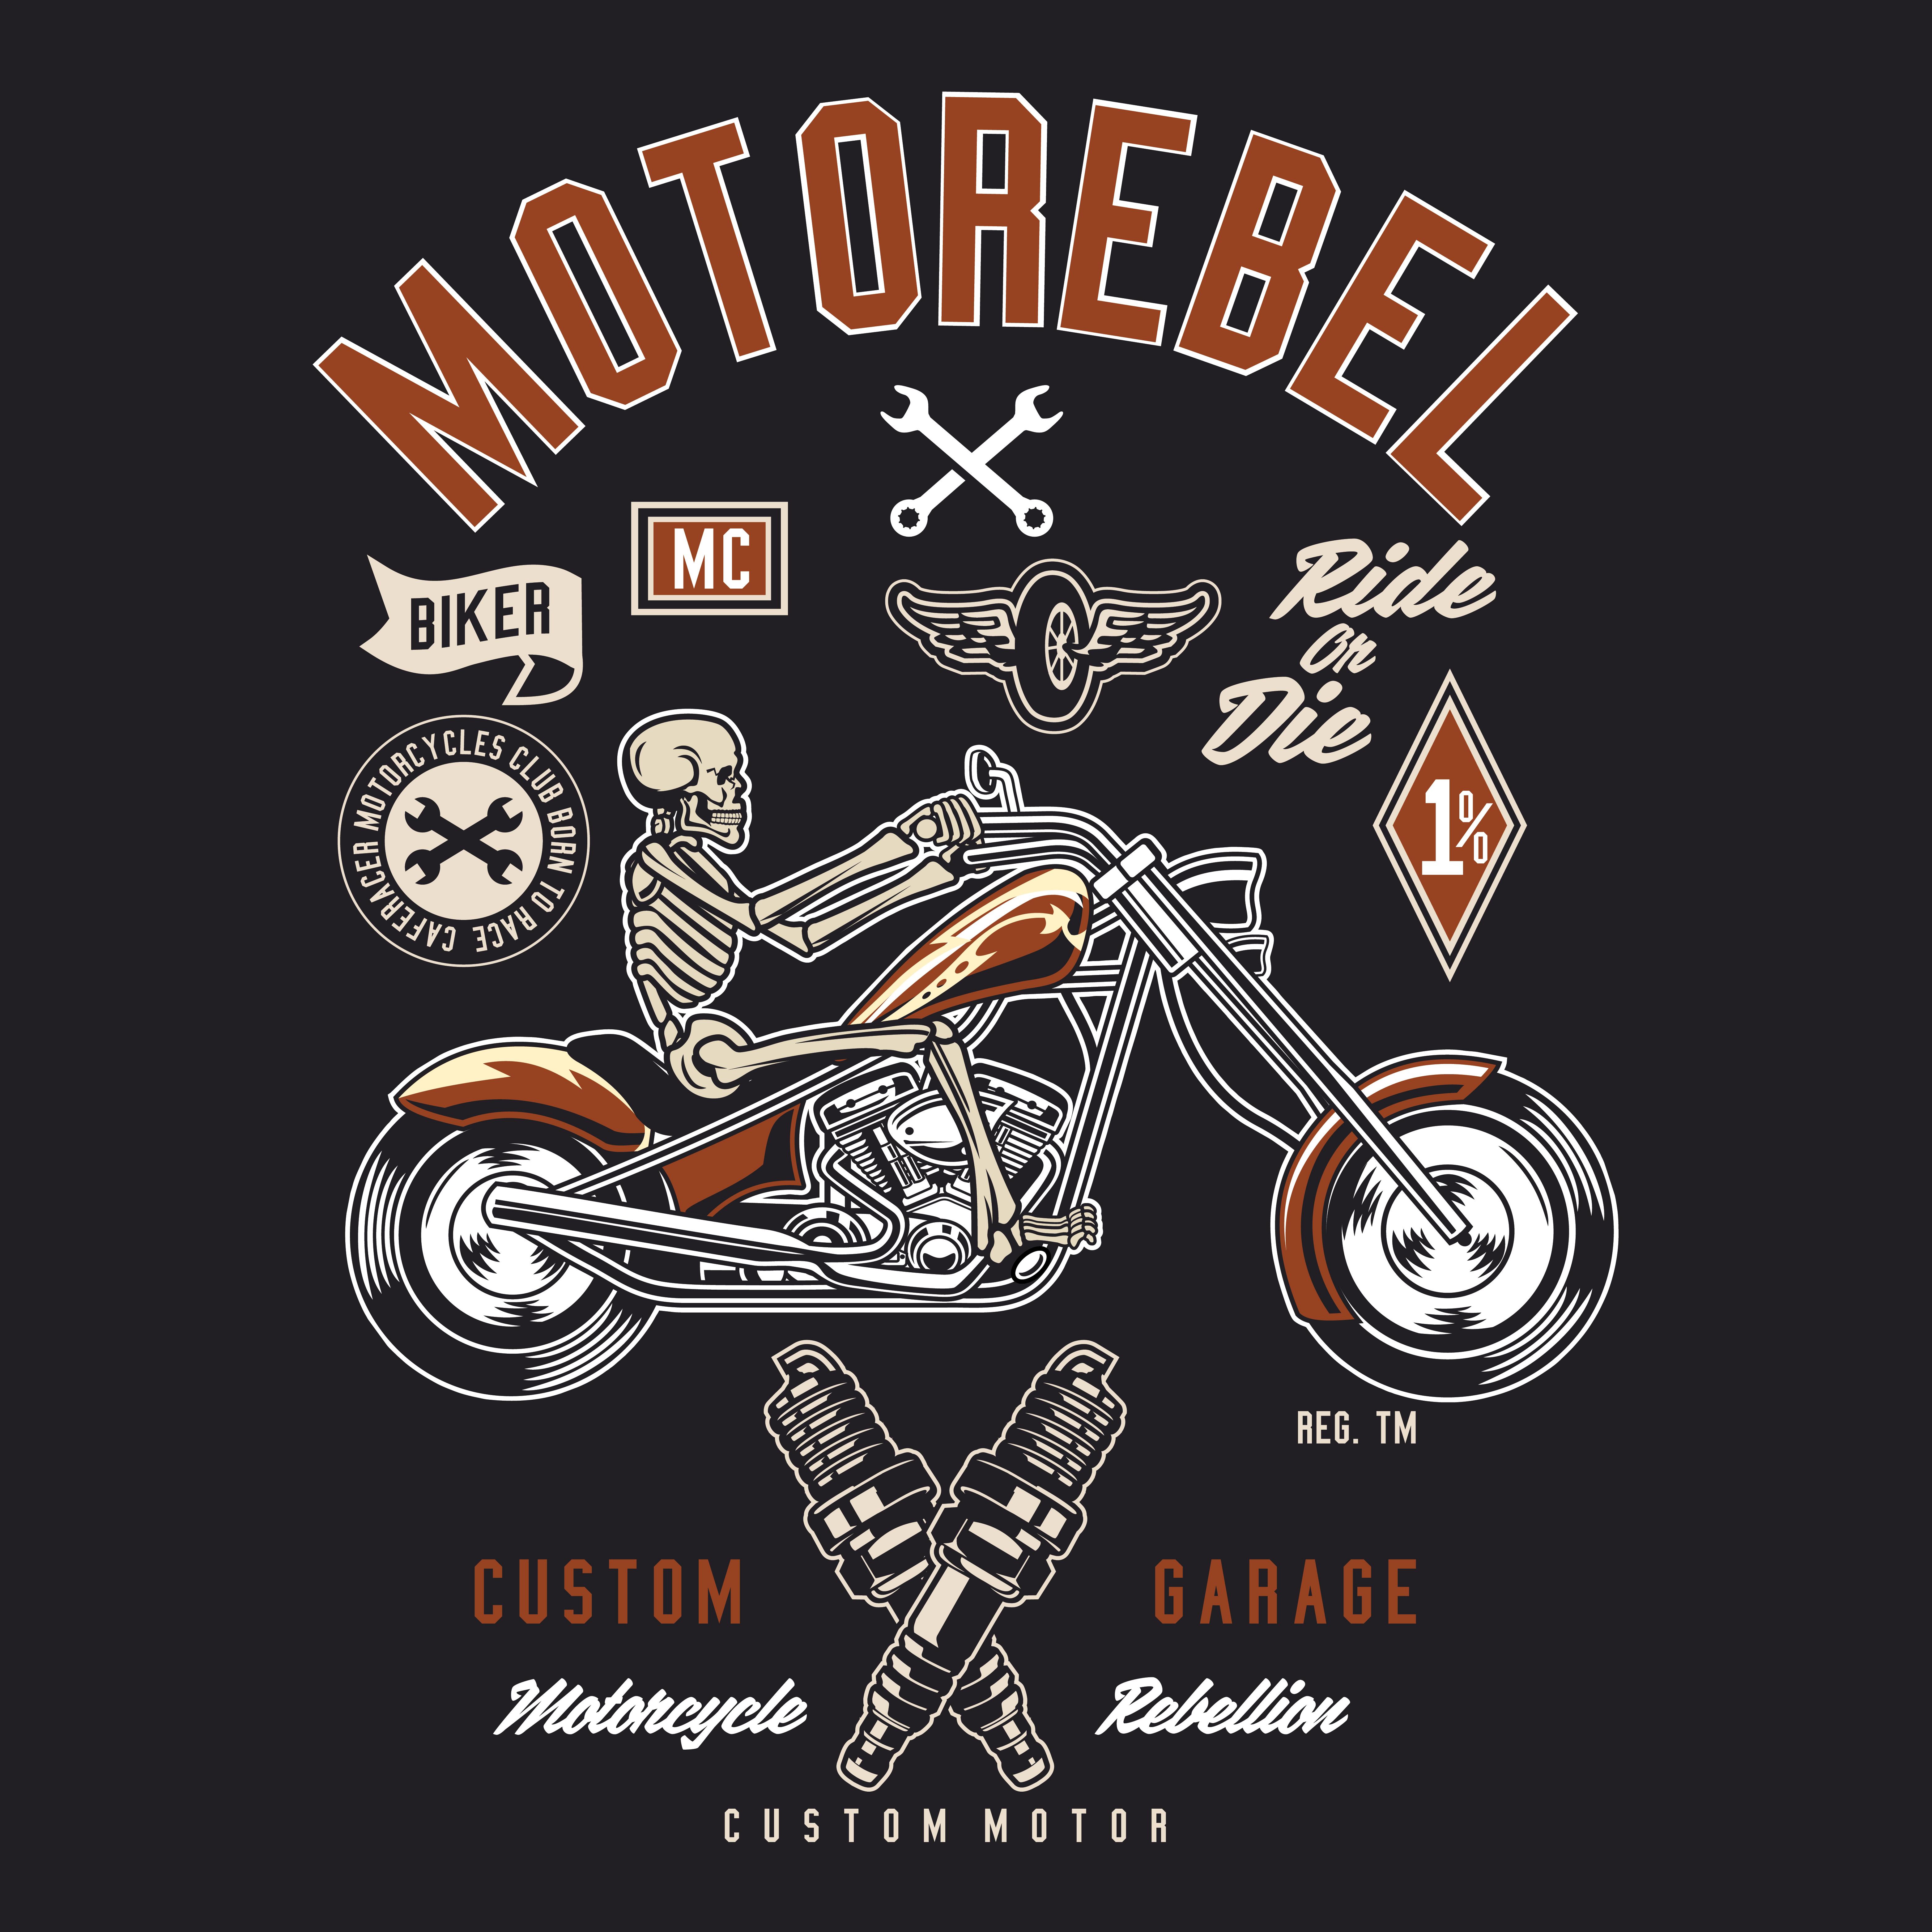 Biker Motorbike Cafe racer Speed Rebel custom Garage men`s t-shirt vintage print